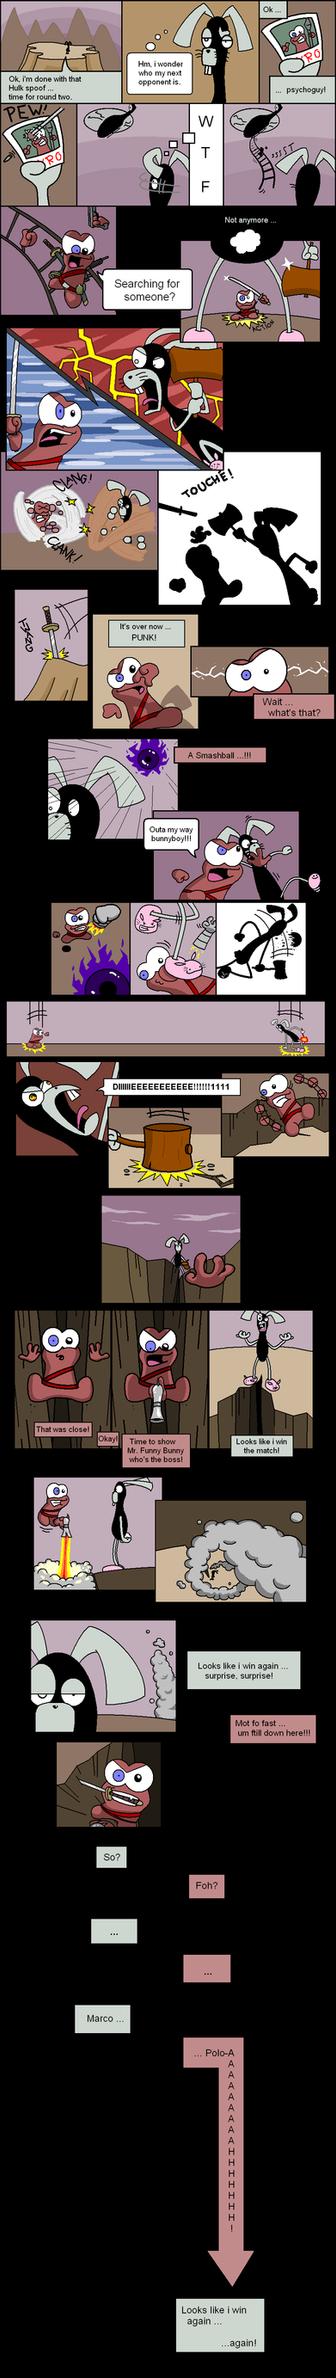 Pyro vs. Byrrit - Epic battle by Captain-Pyro